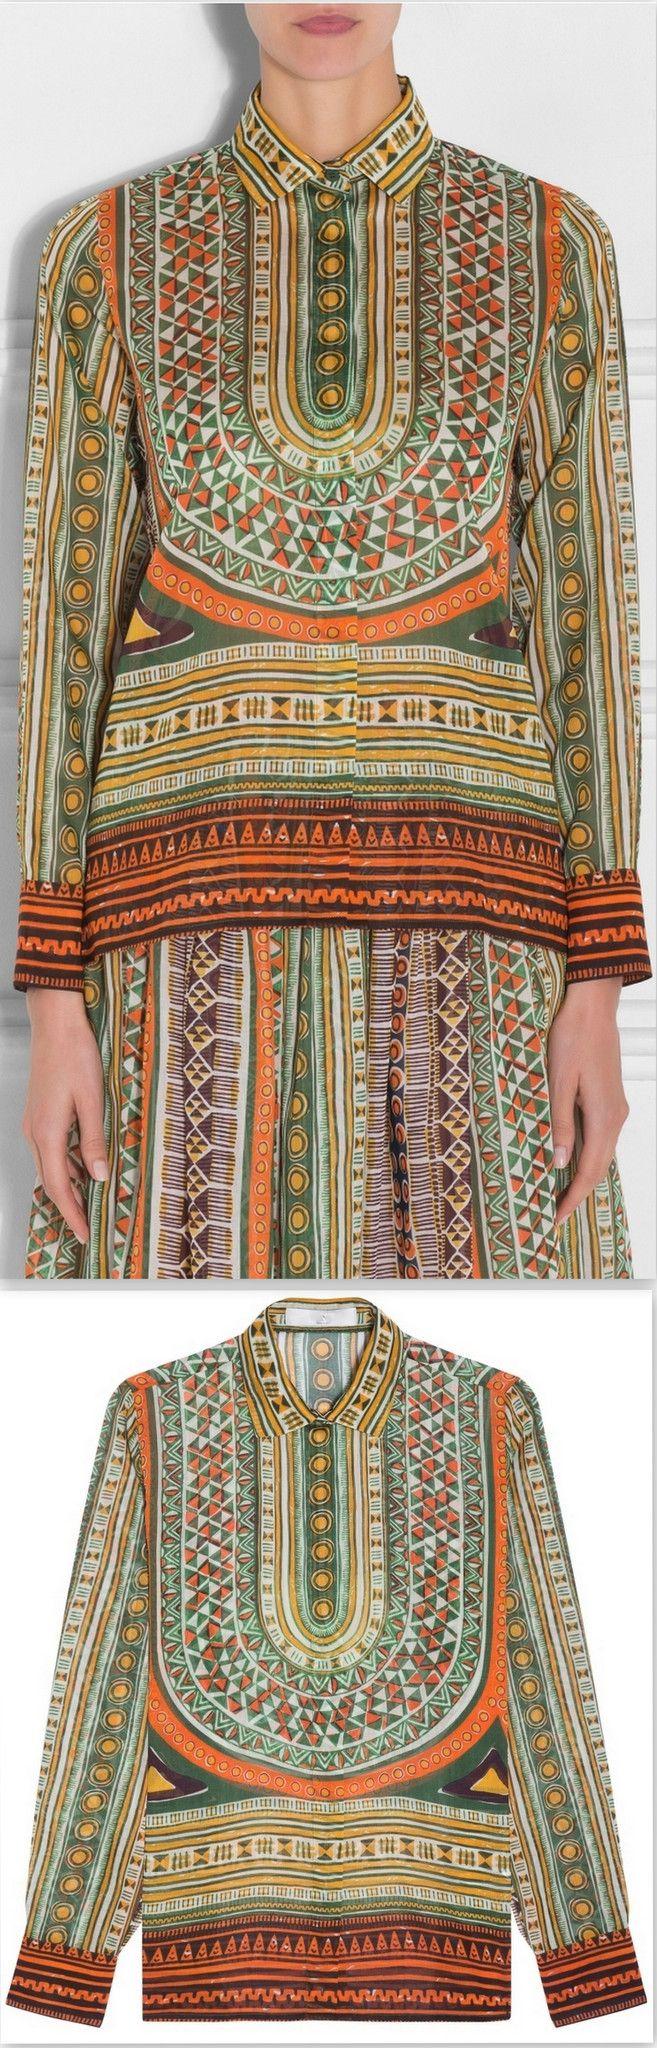 Long Sleeve Tribal Shirt